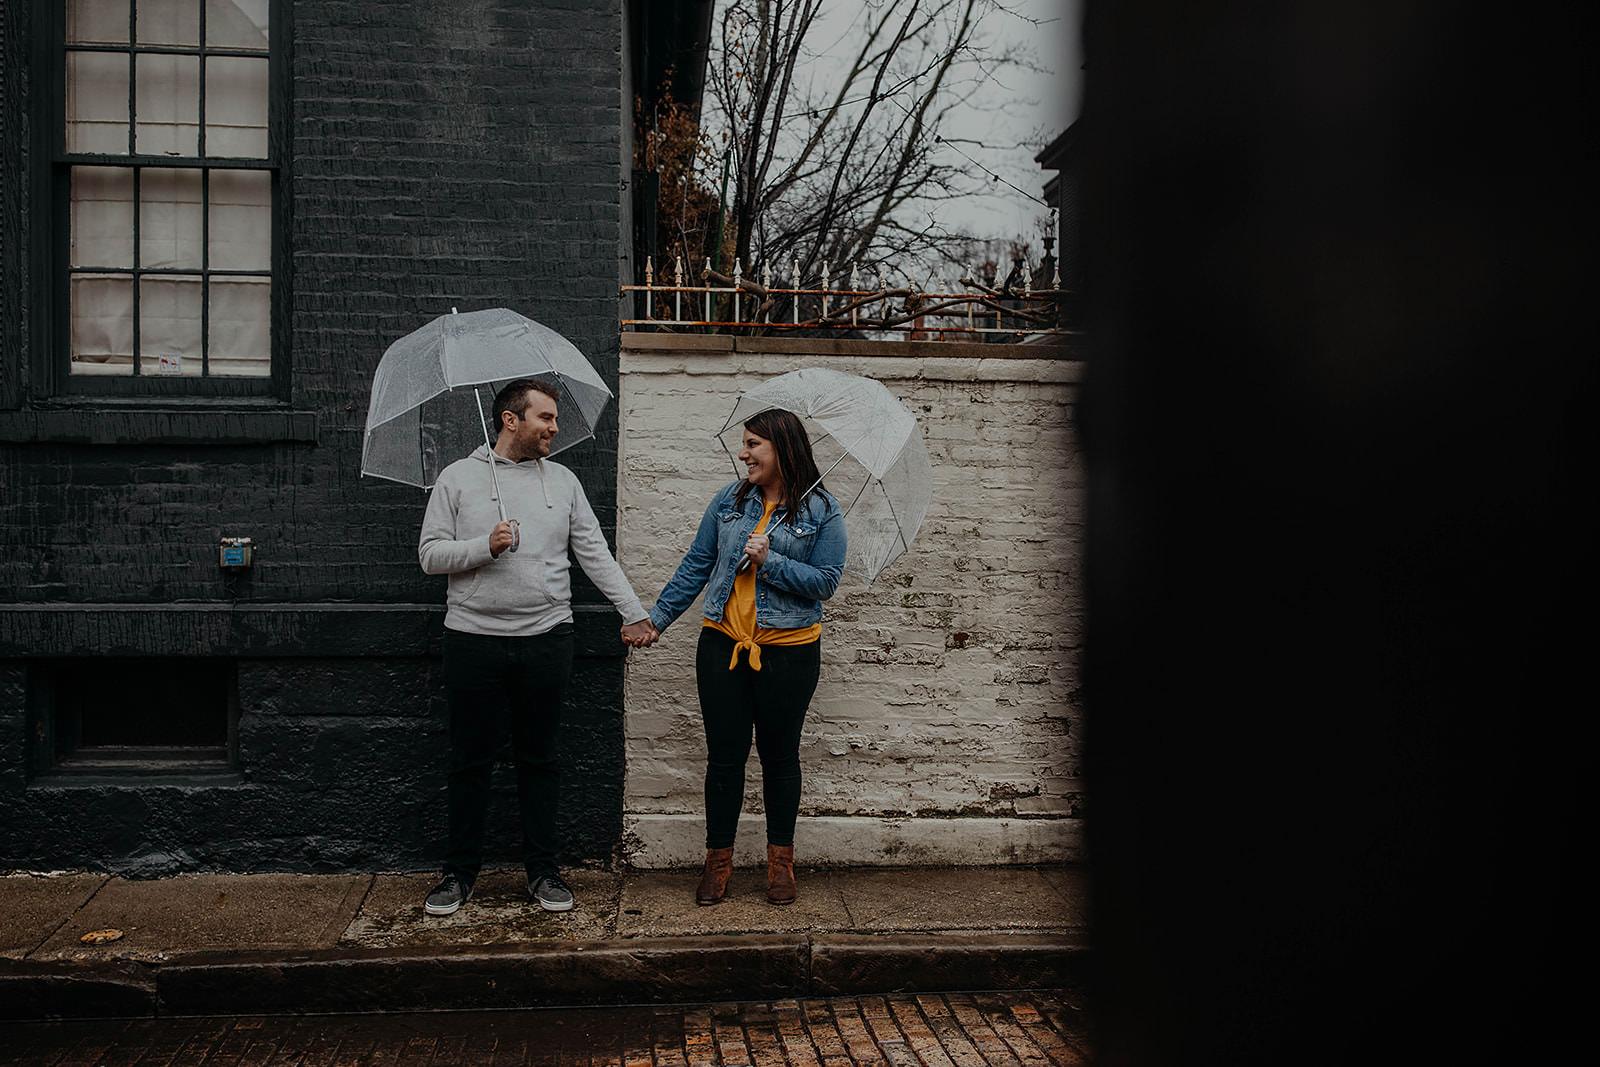 Rainy day engagement photos german village columbus ohio wedding photographer grace e jones photography15.jpg